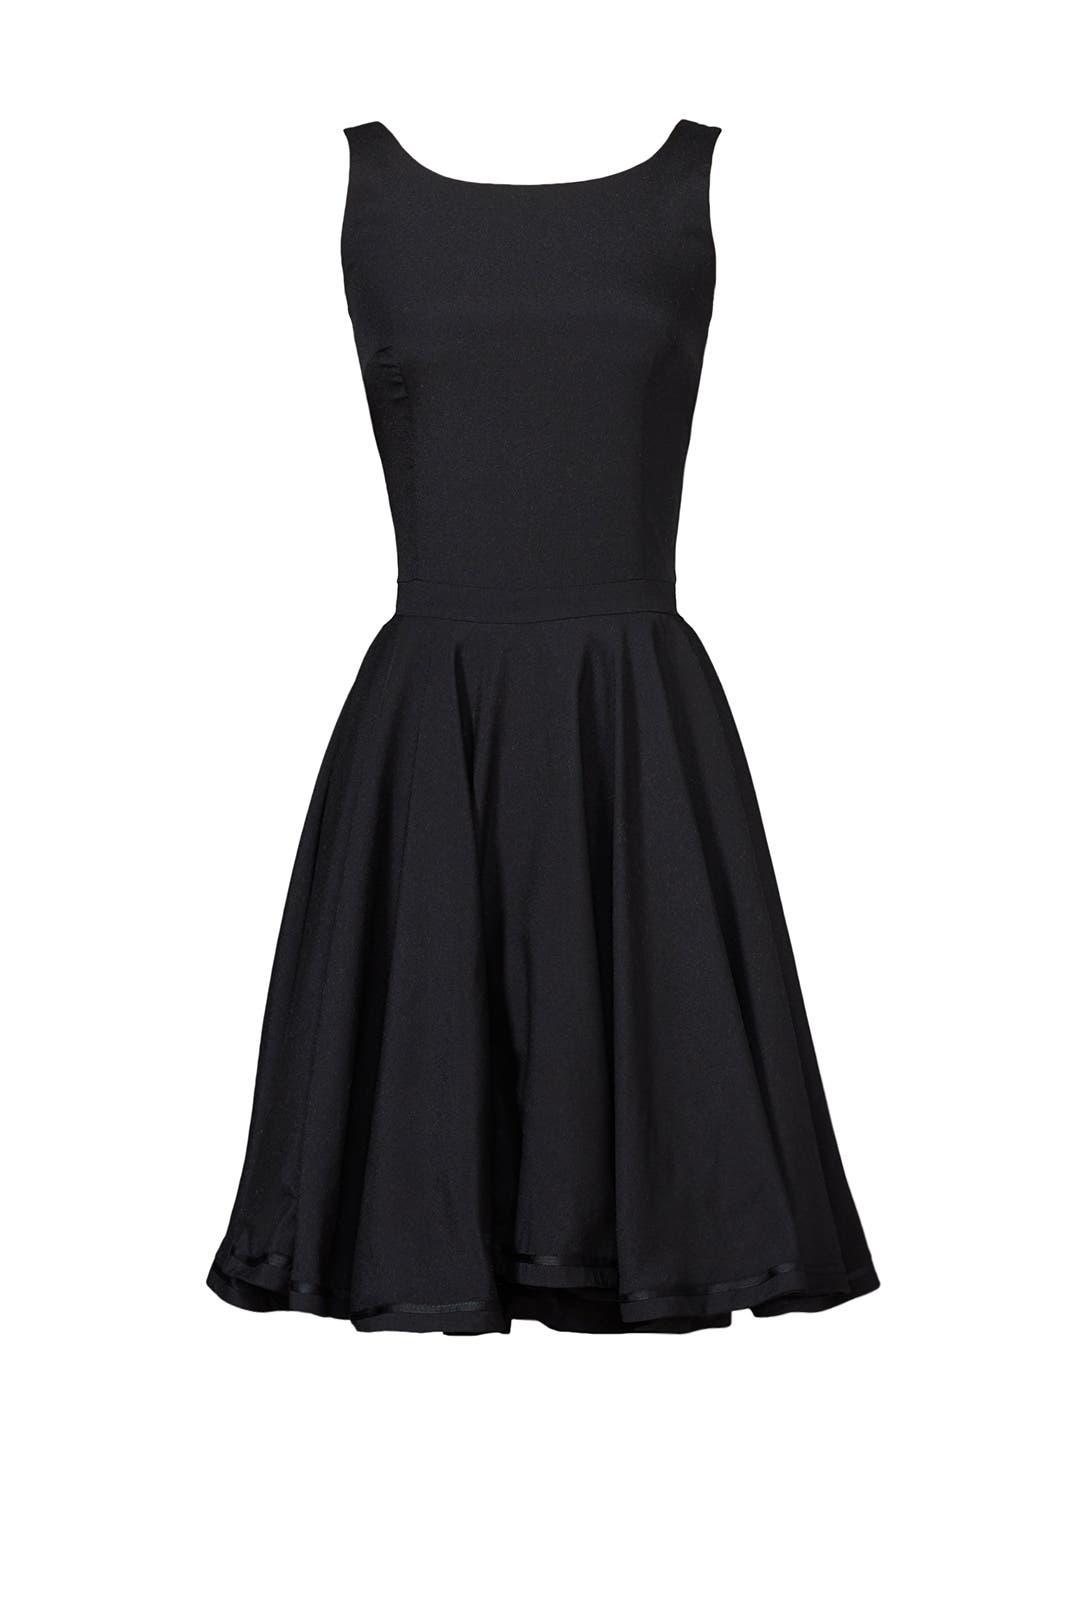 Night Watch Dress by allison parris